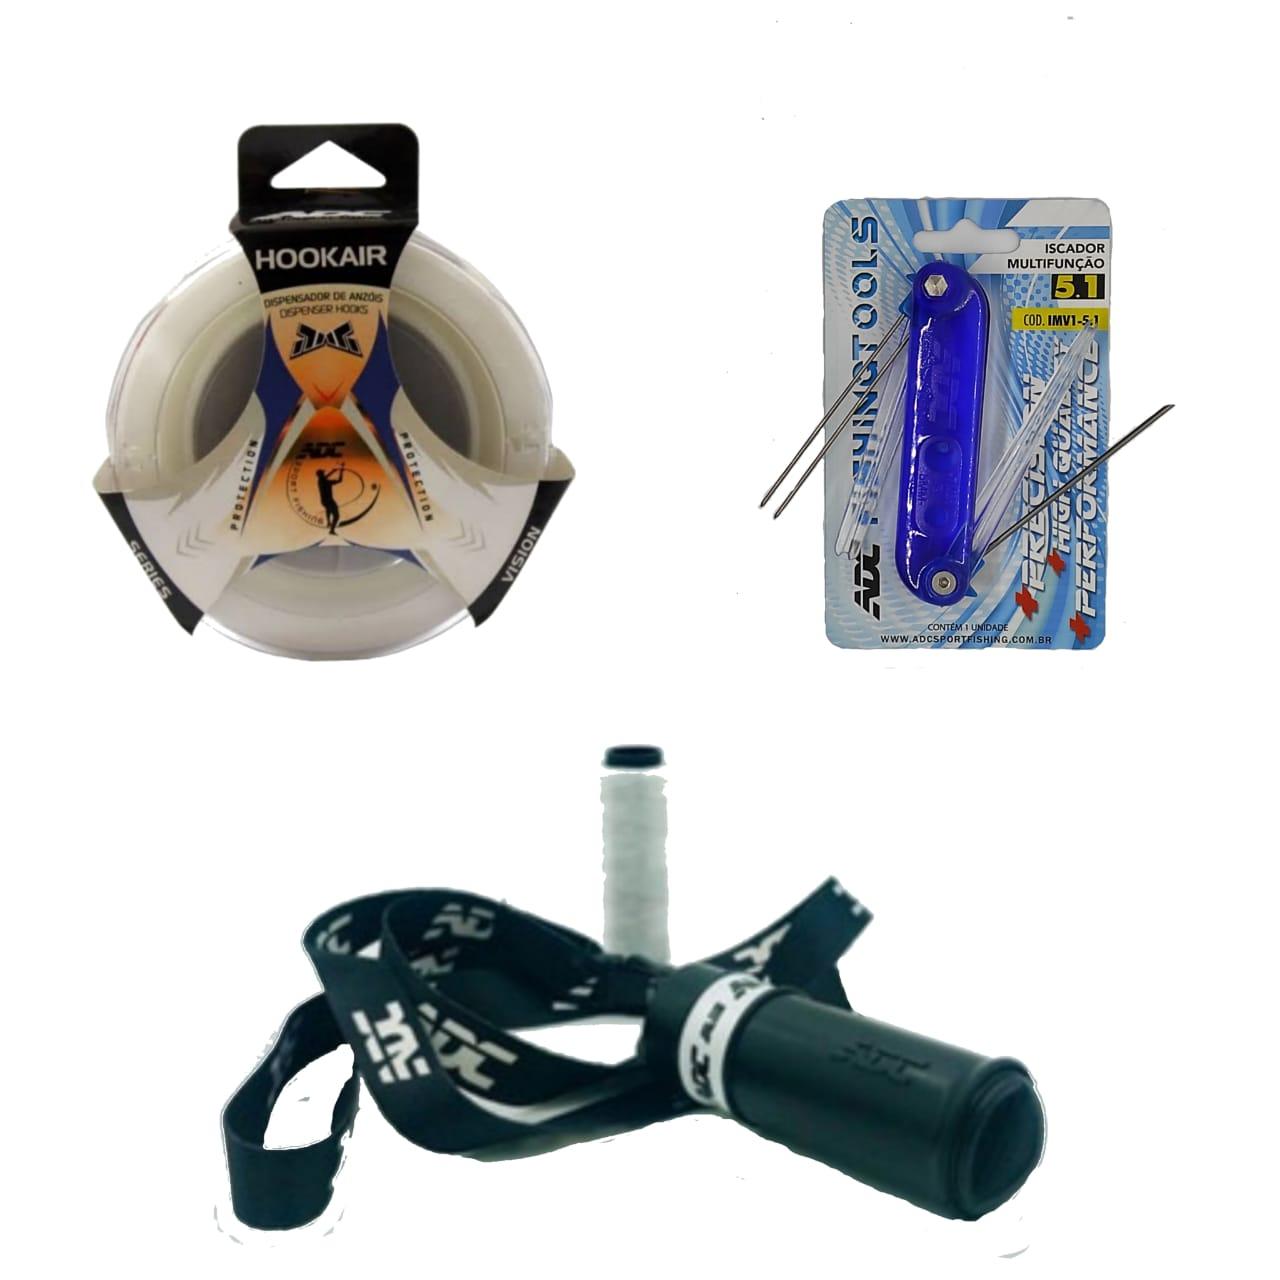 Kit ADC - Hookair + Iscador + Porta Elastico